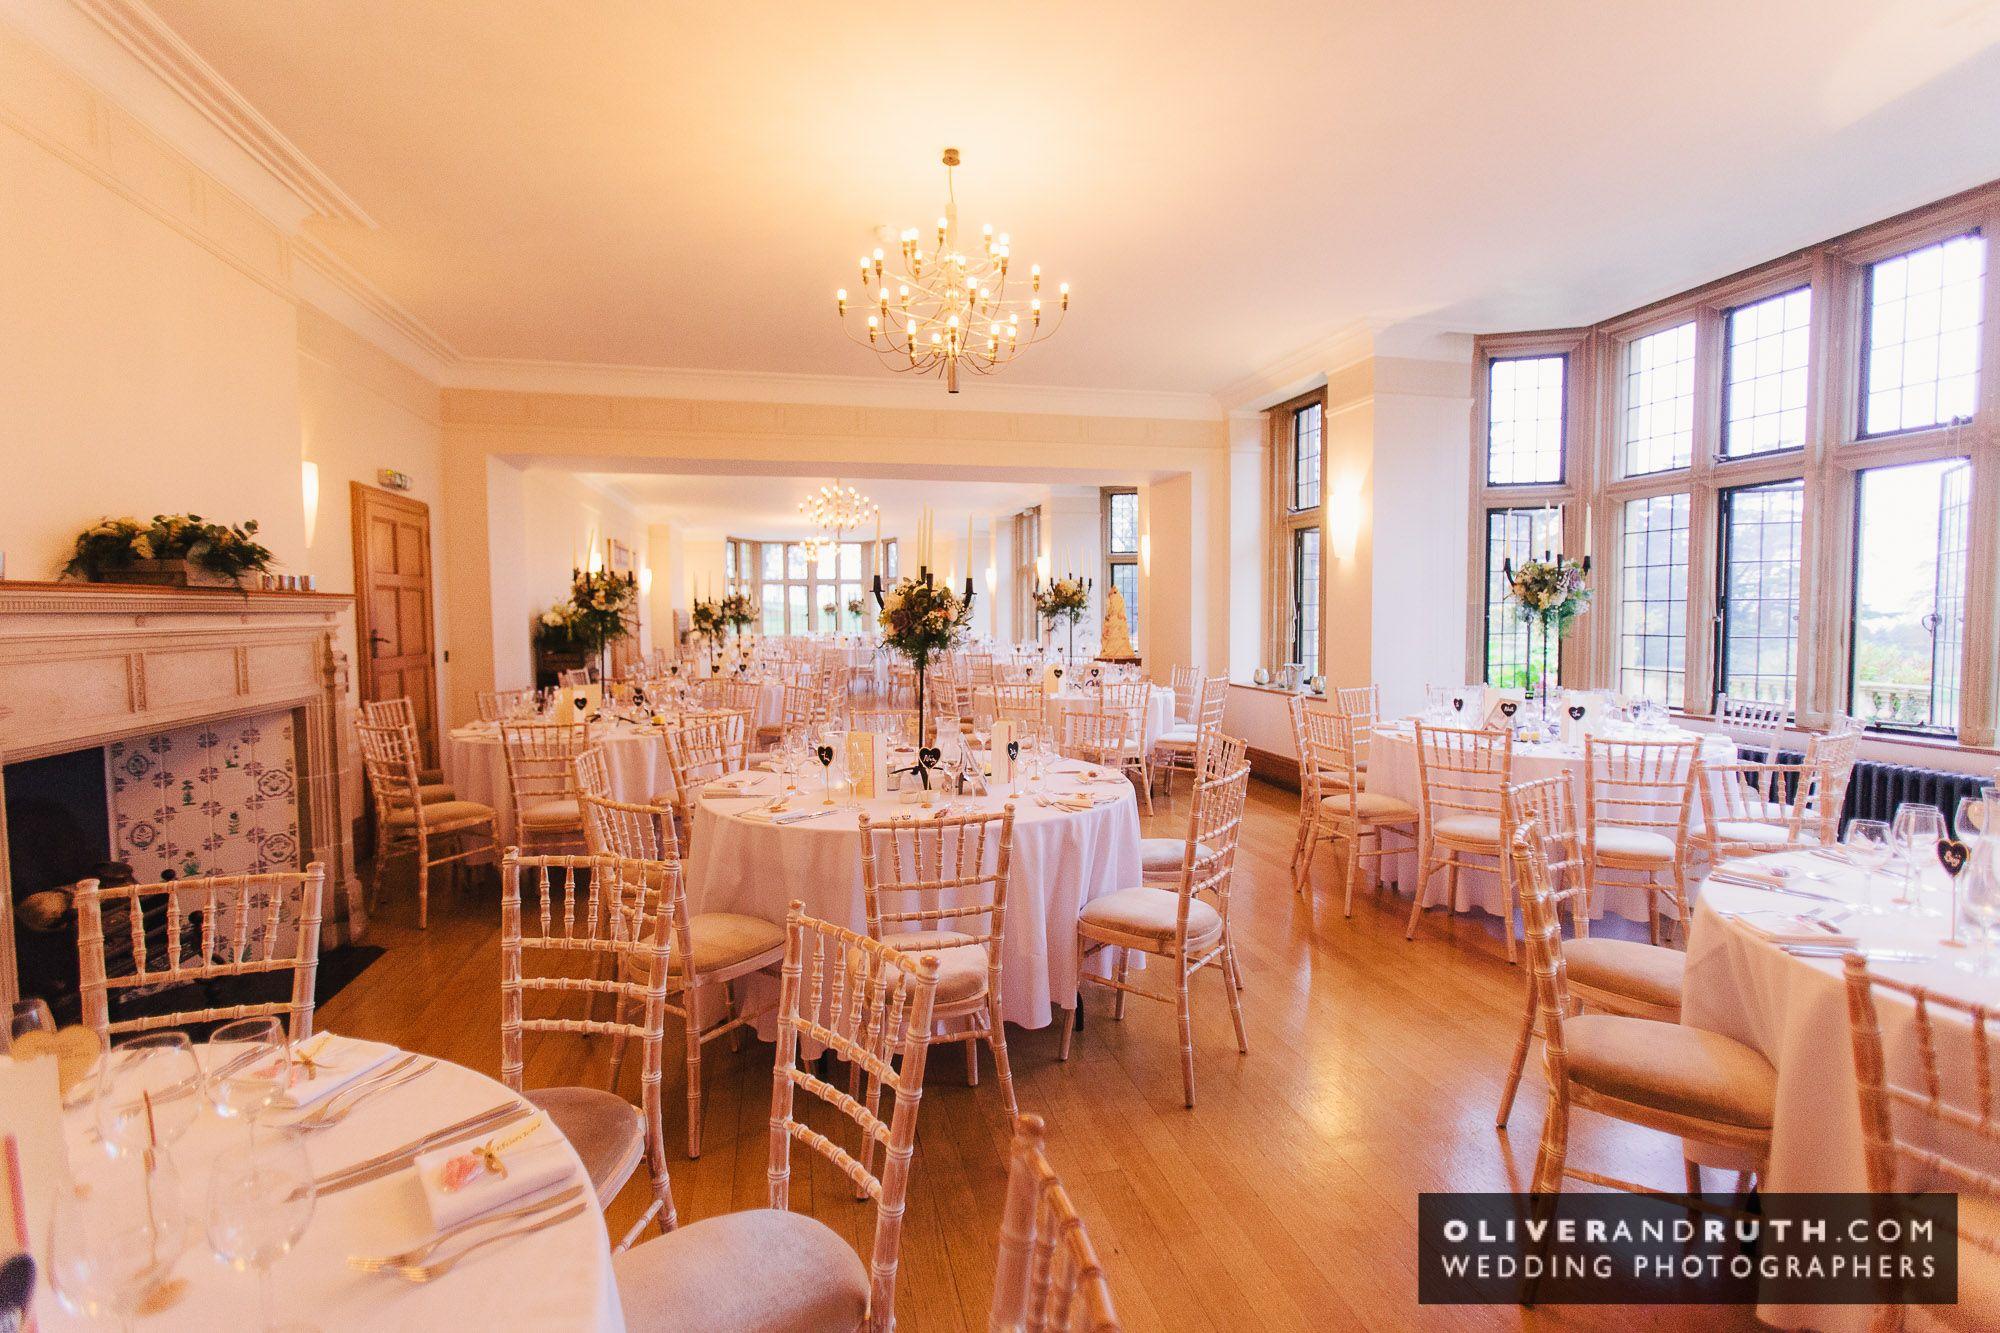 Wedding venue decoration images  Wedding Venue Decoration  Charlotte and Matthew  Pinterest